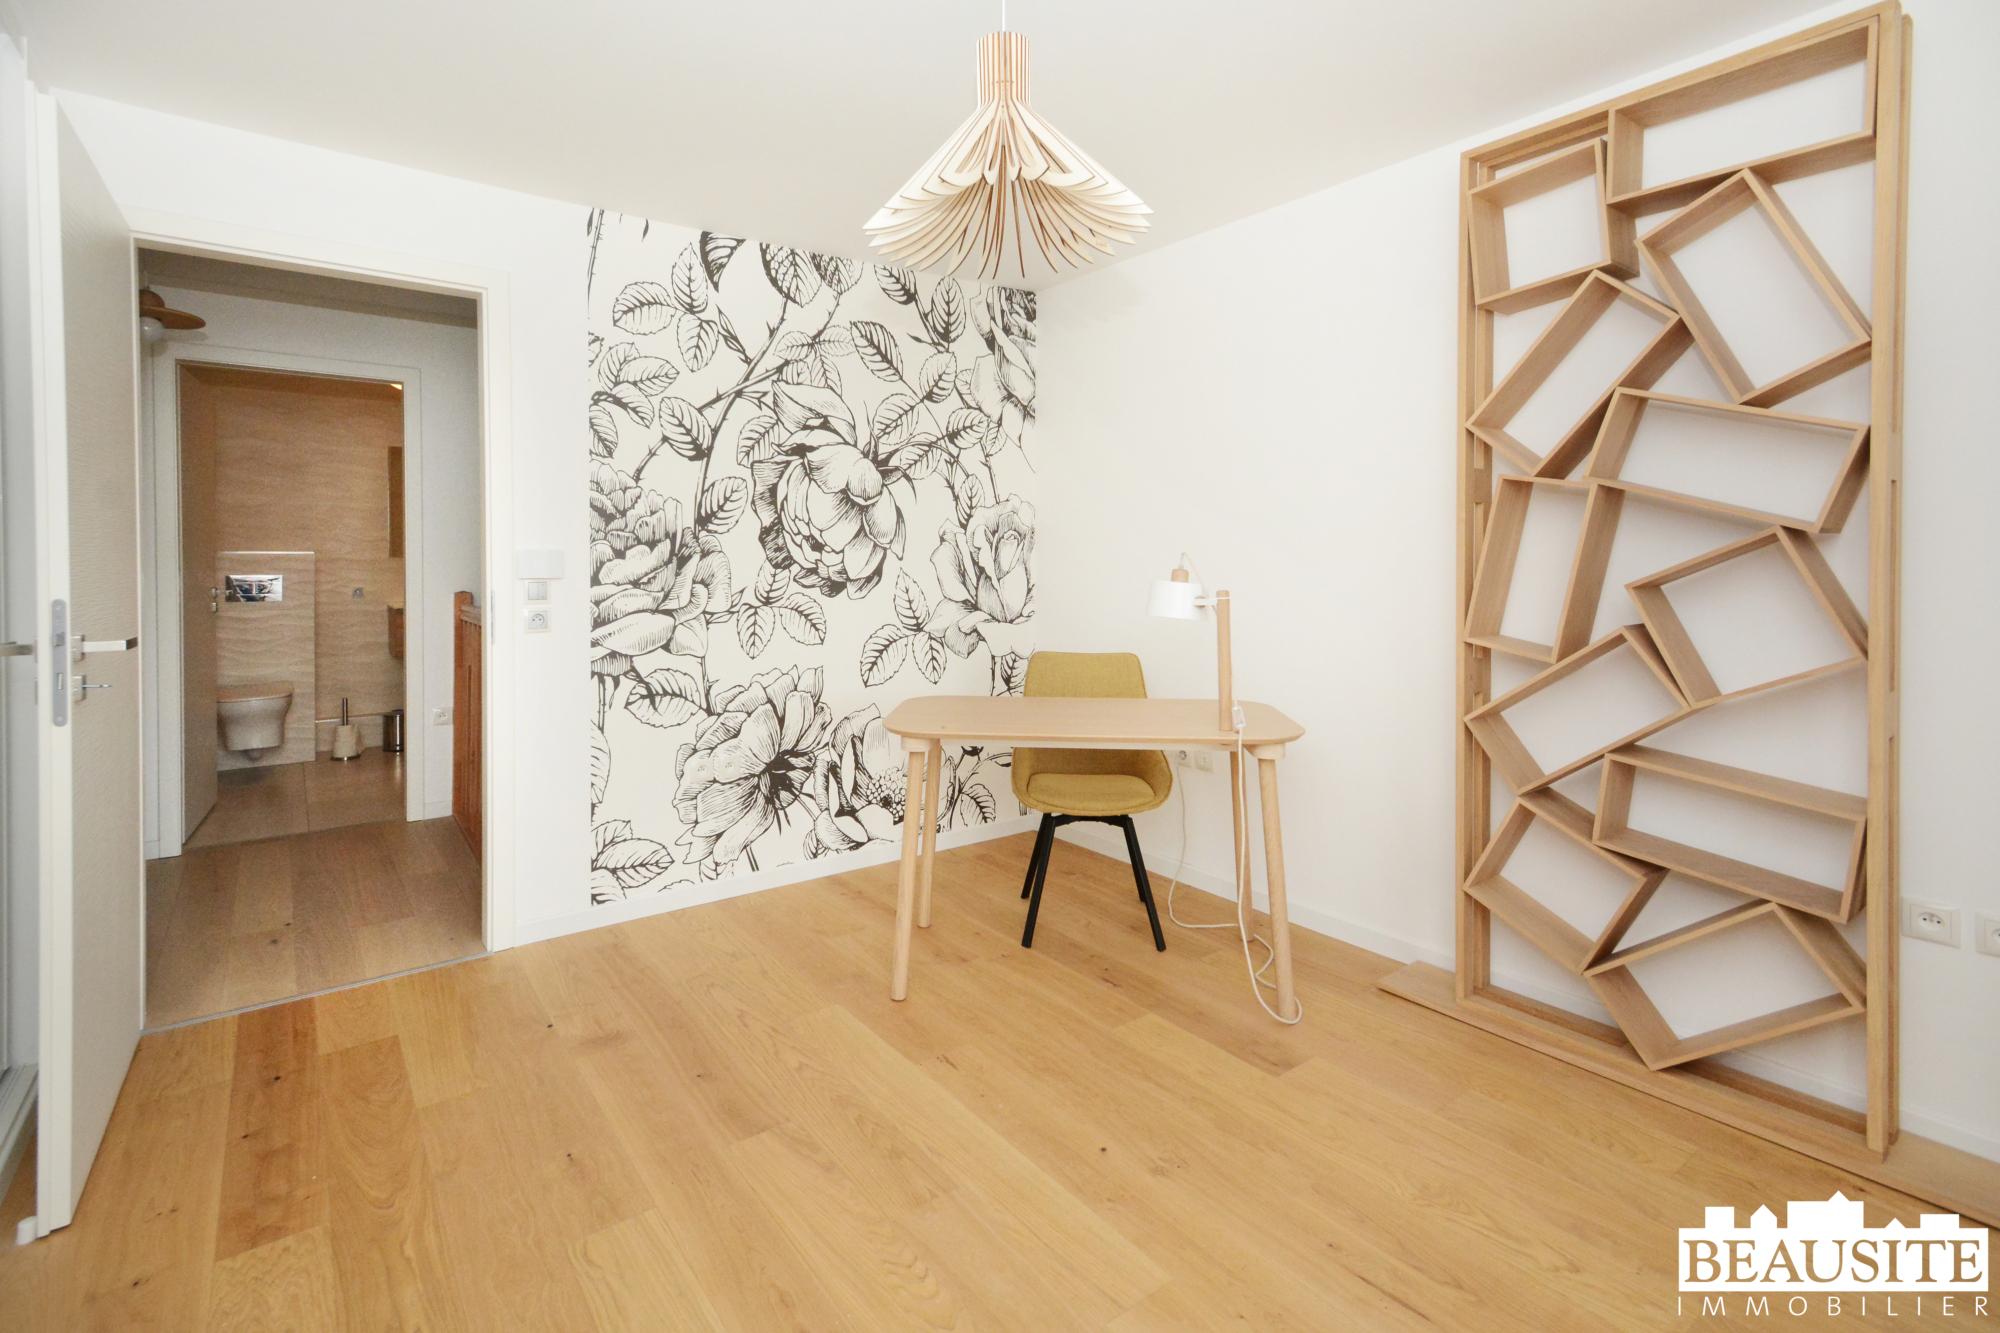 [Yoga] Splendide 4 pièces meublé, en duplex, avec terrasses - Neudorf / Écoquartier